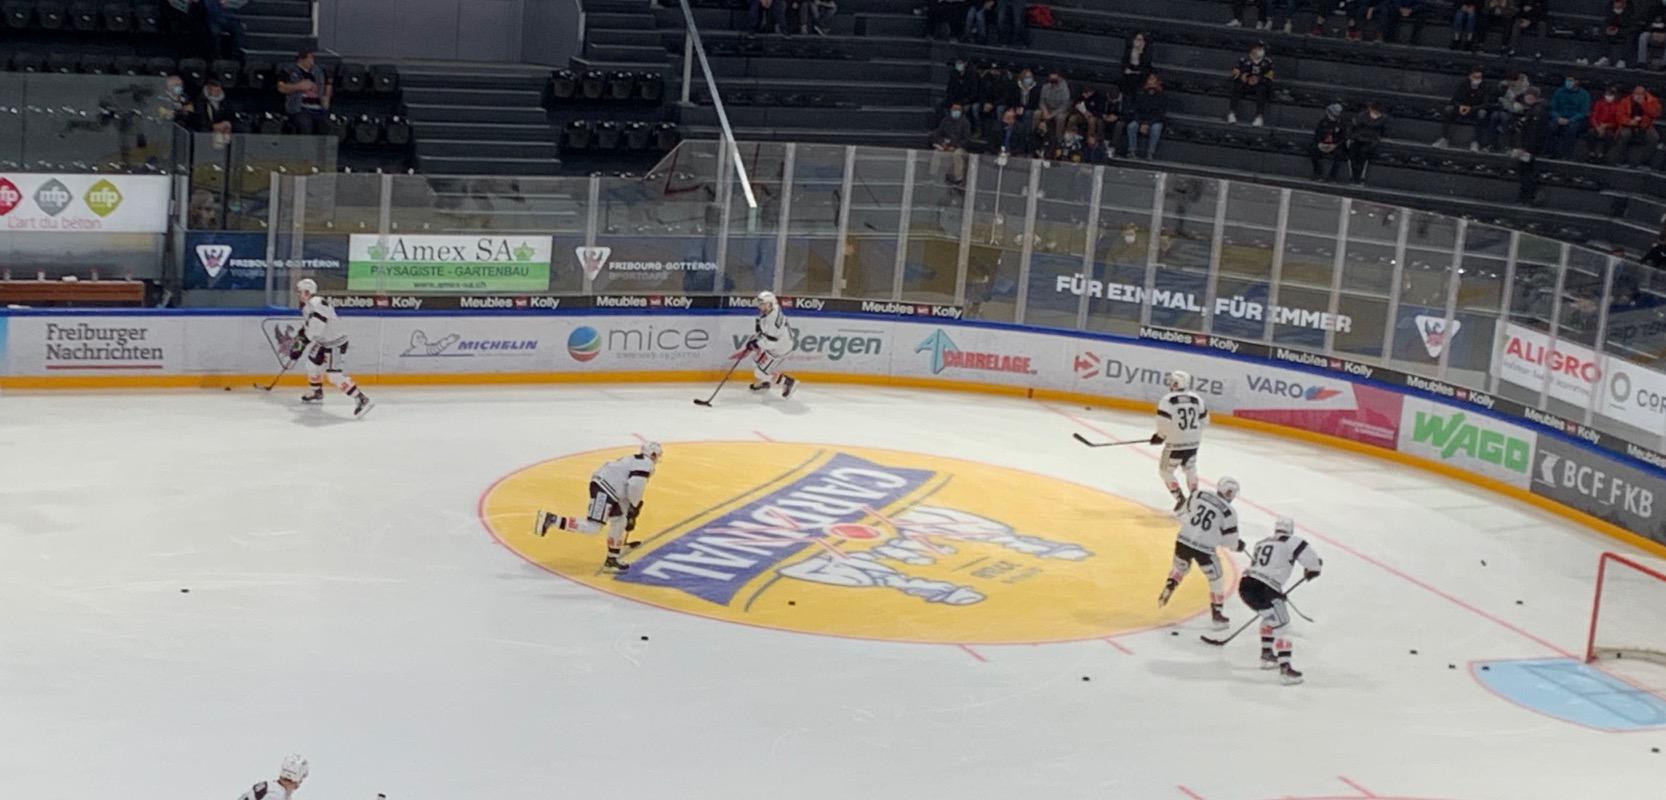 Mice Swiss sponsor du HC Fribourg Gotteron